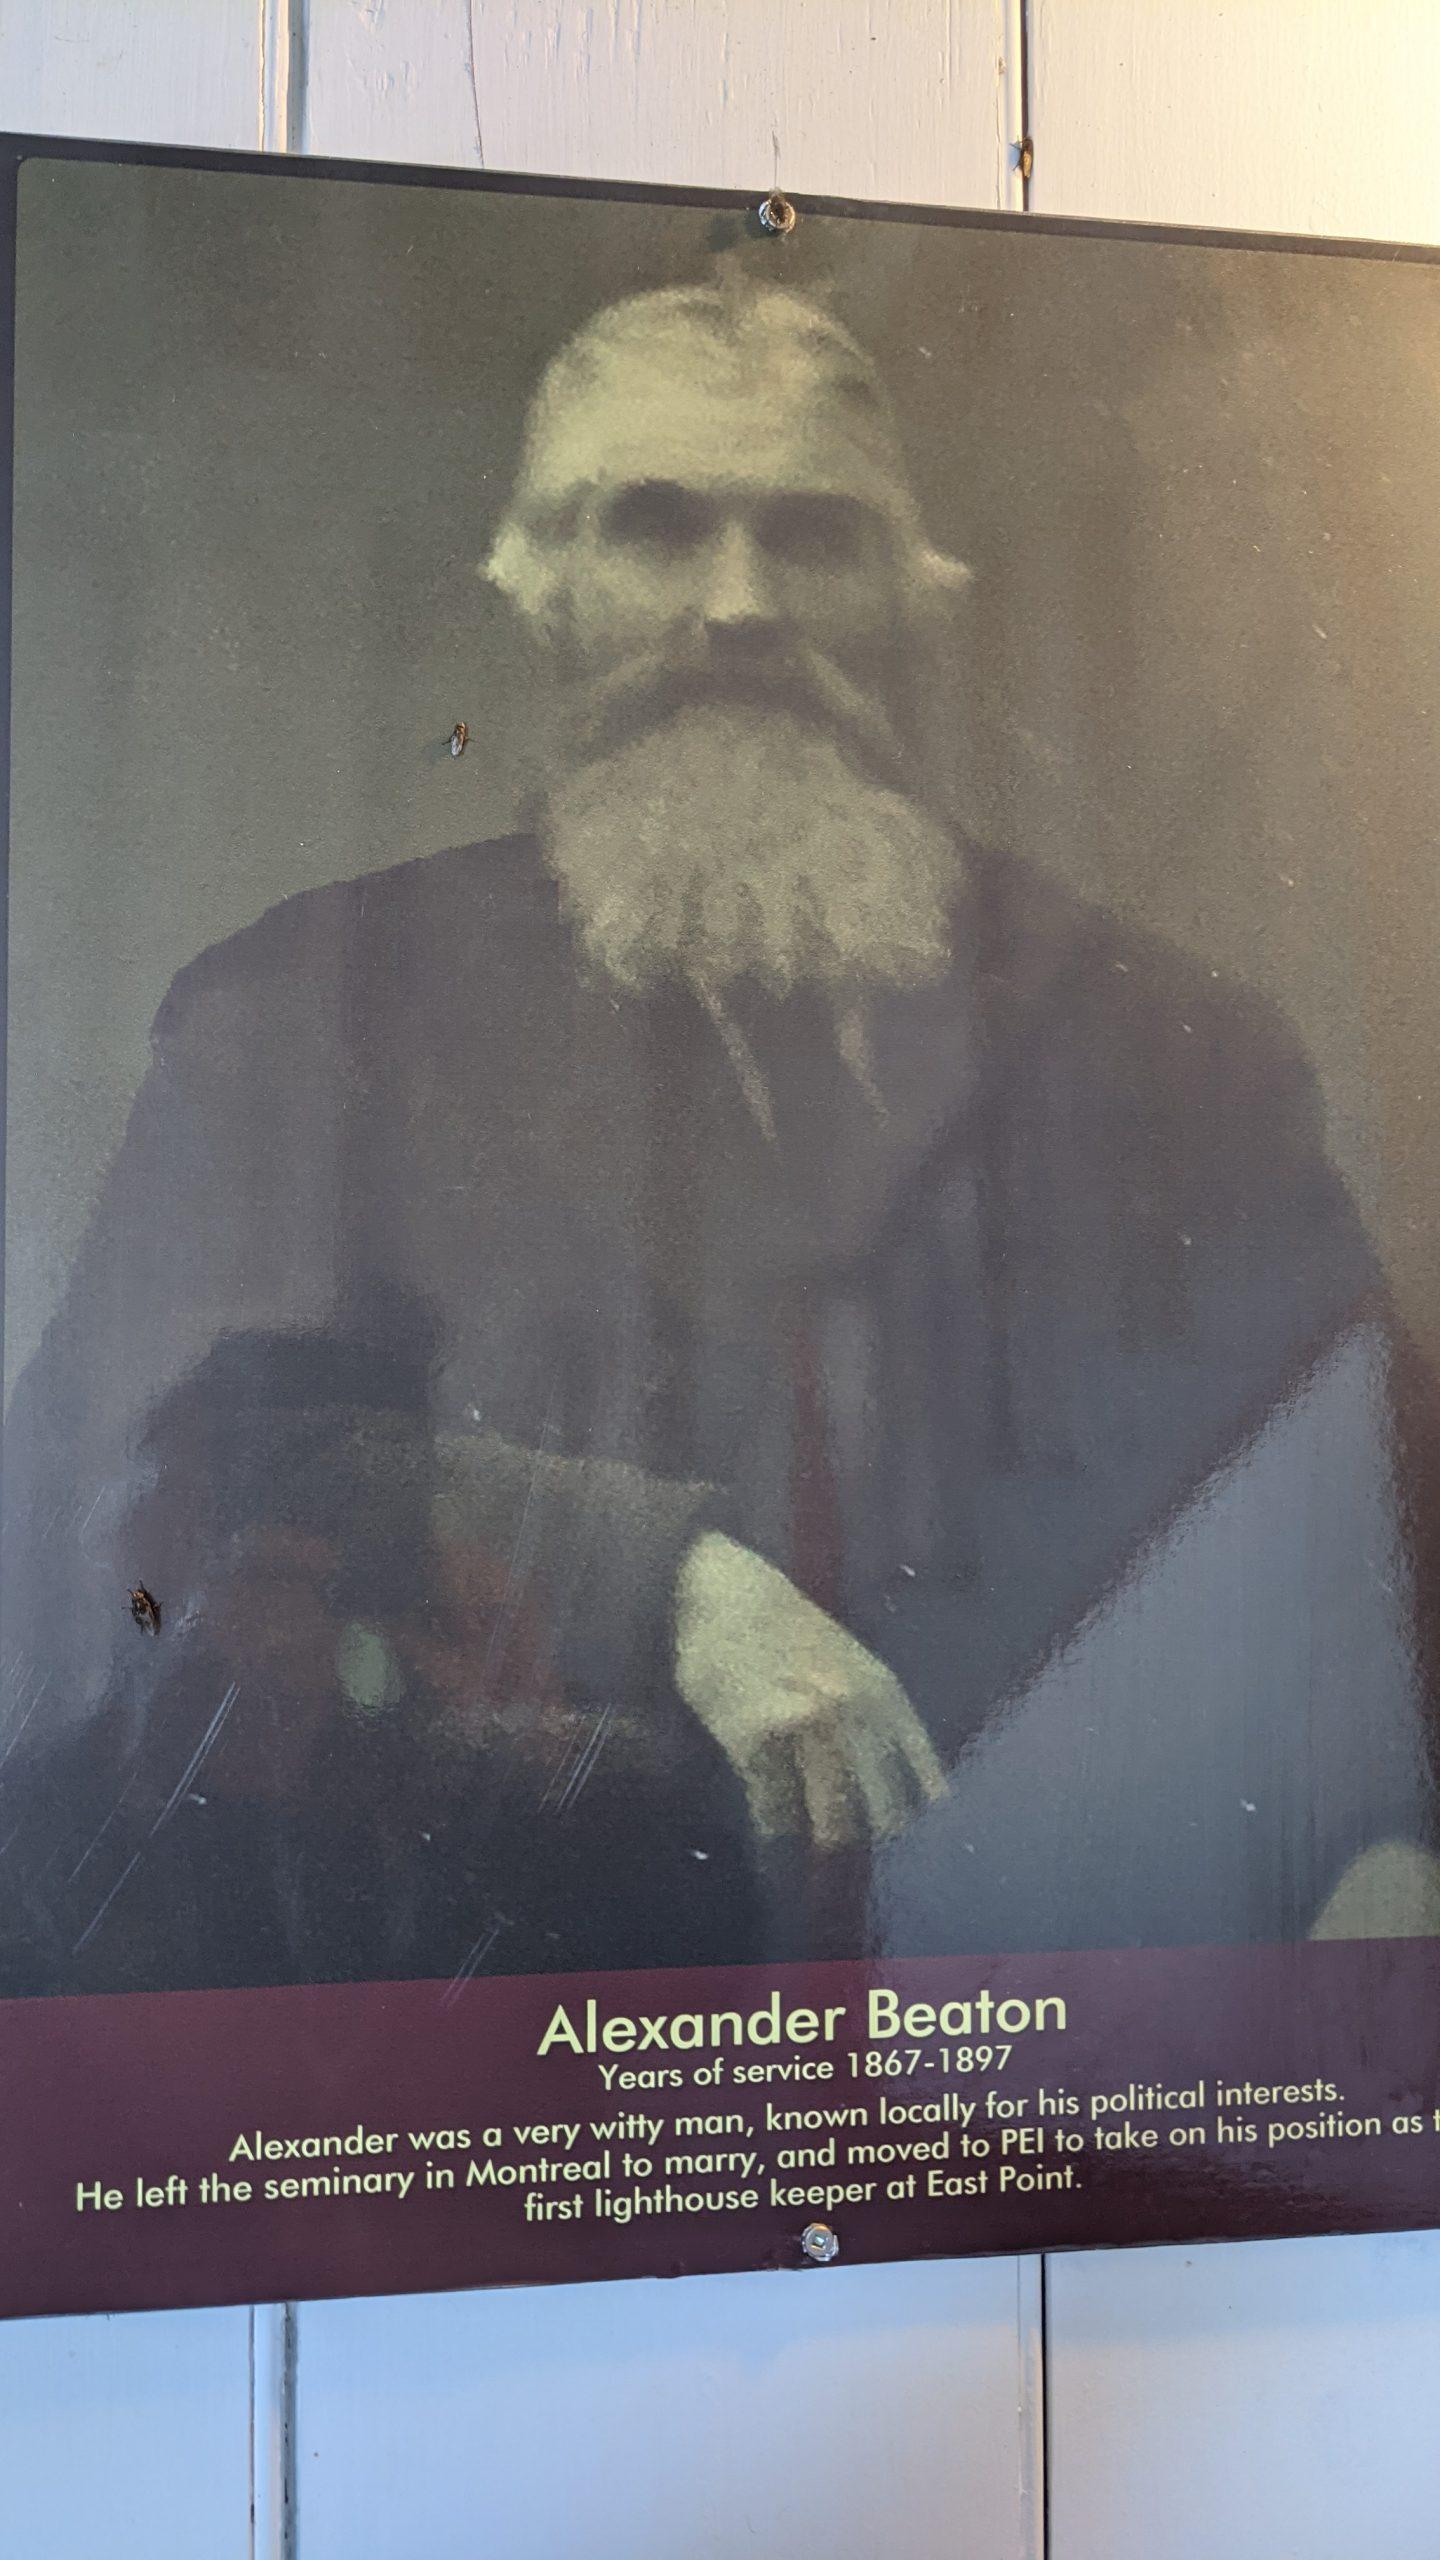 Alexander Beaton (1867-1897)